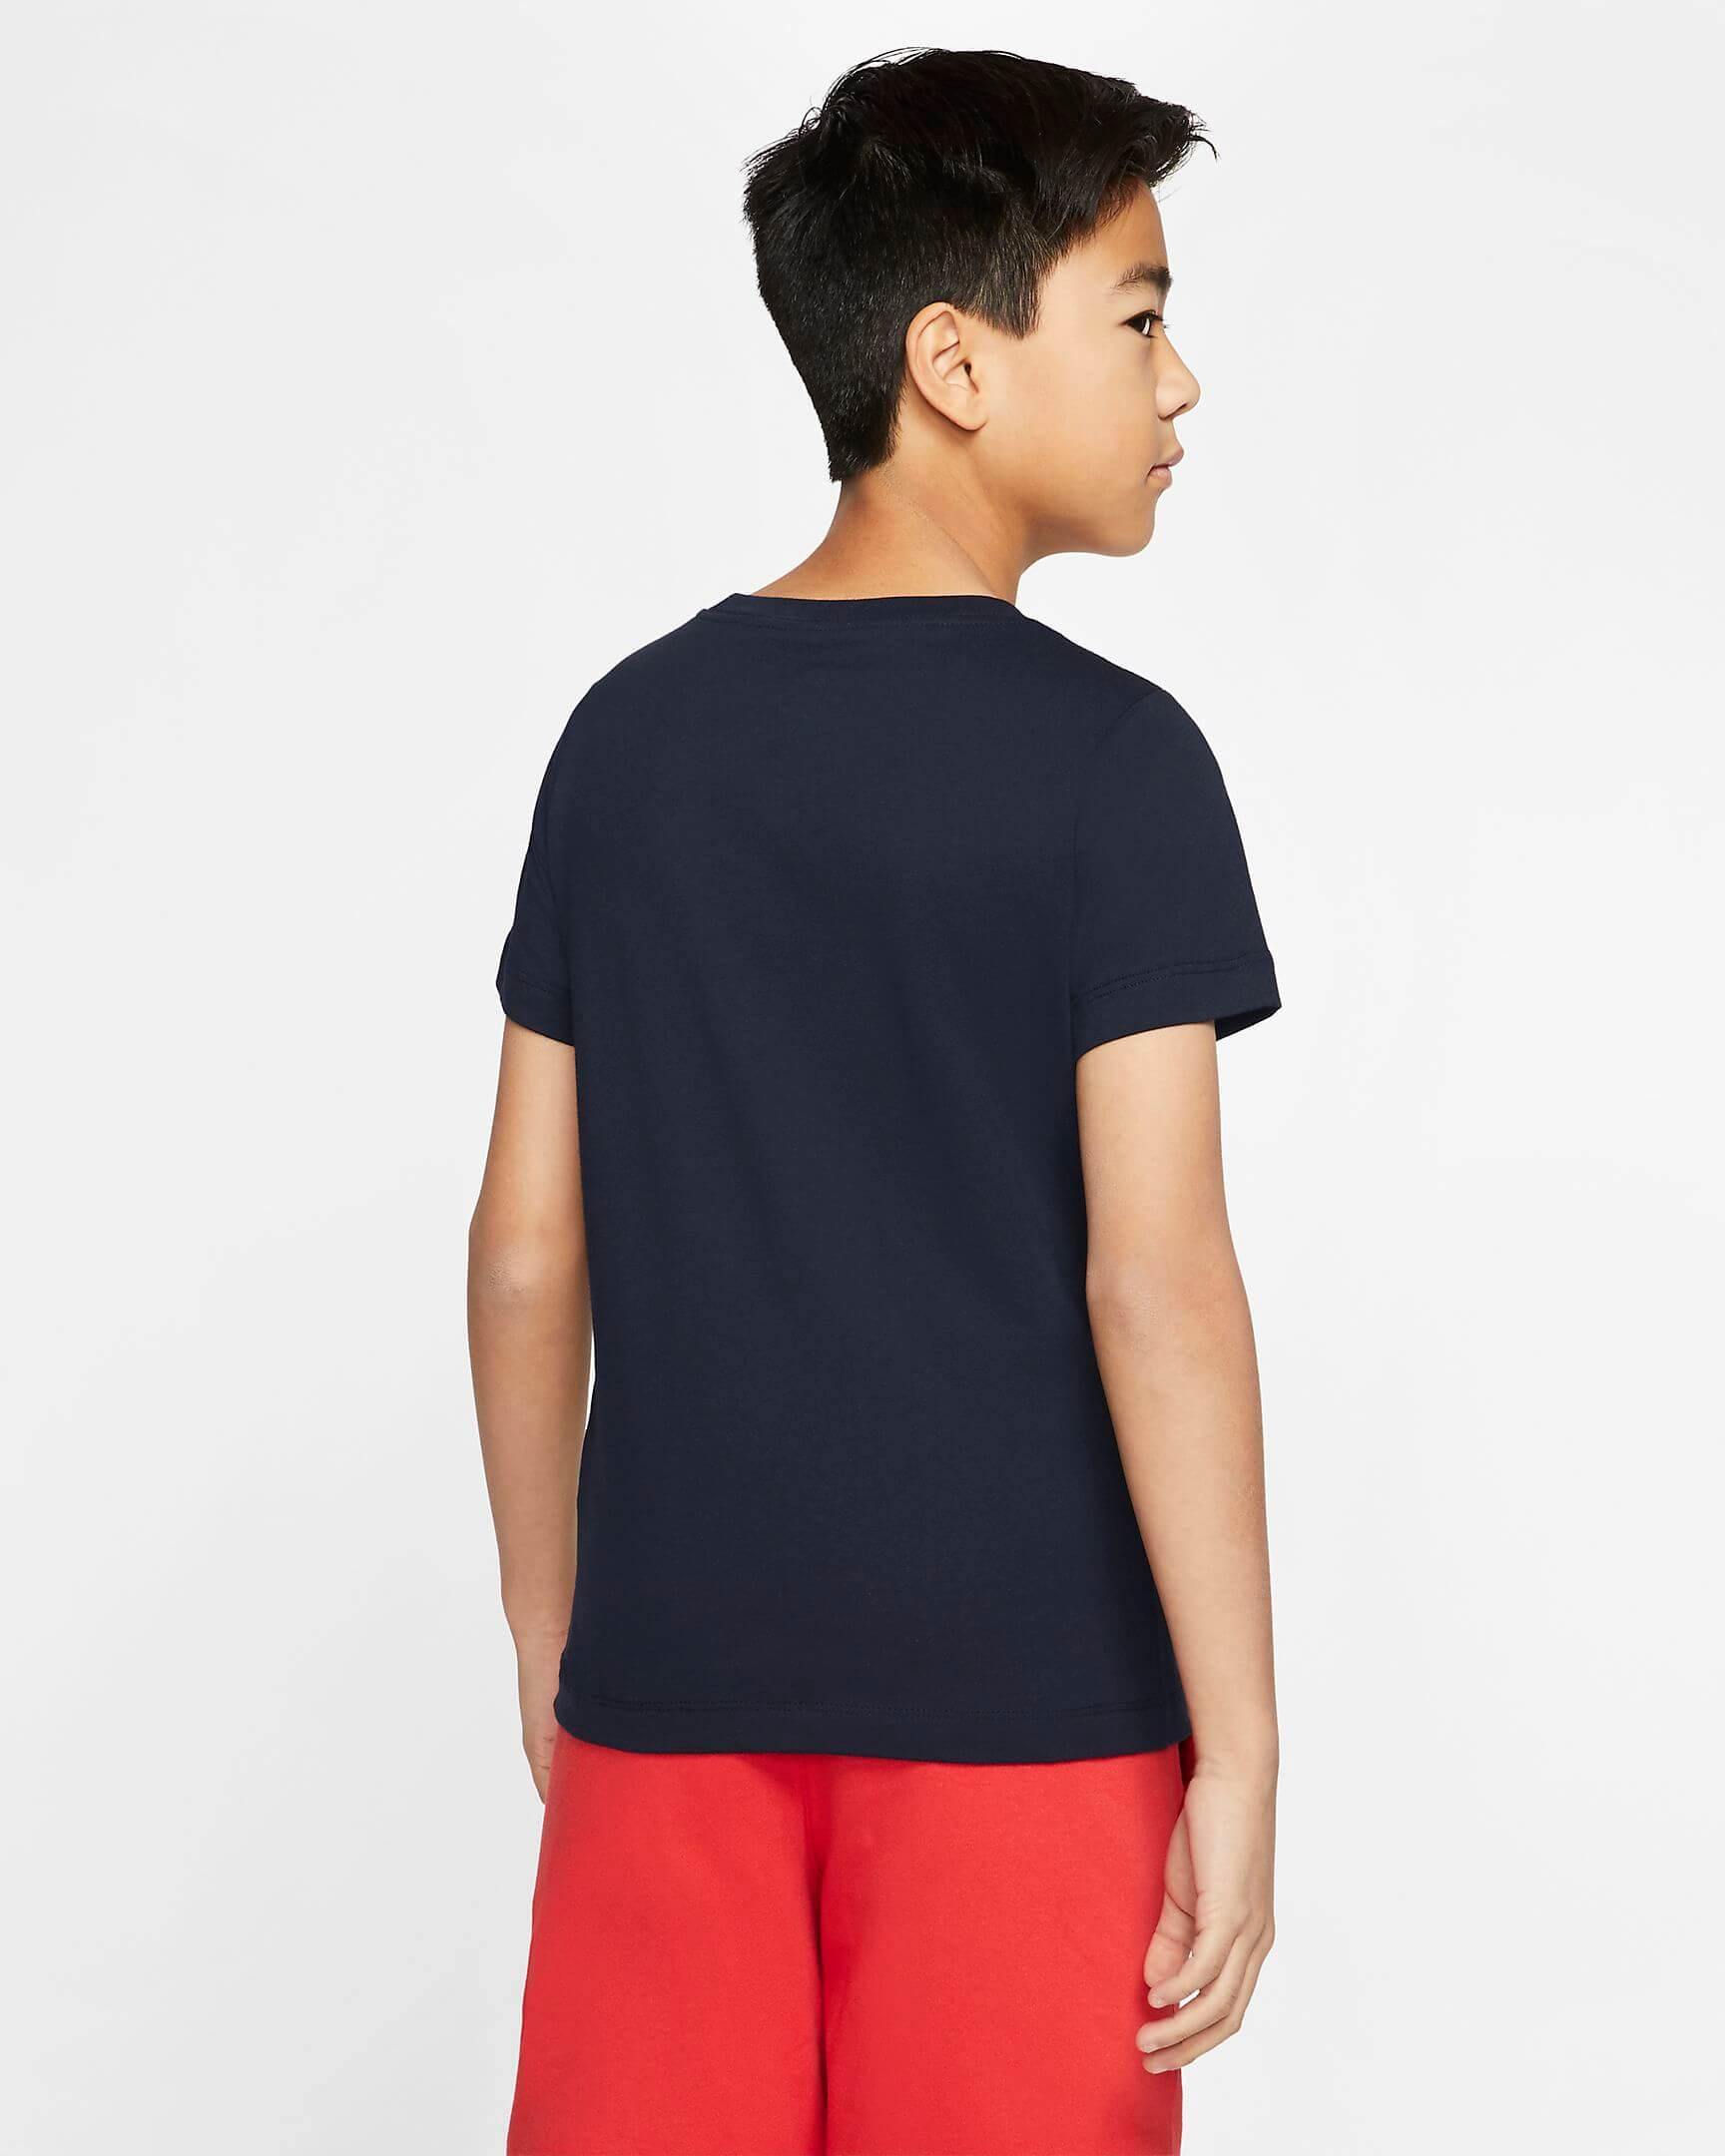 Emb Futura Çocuk Mavi Tişört